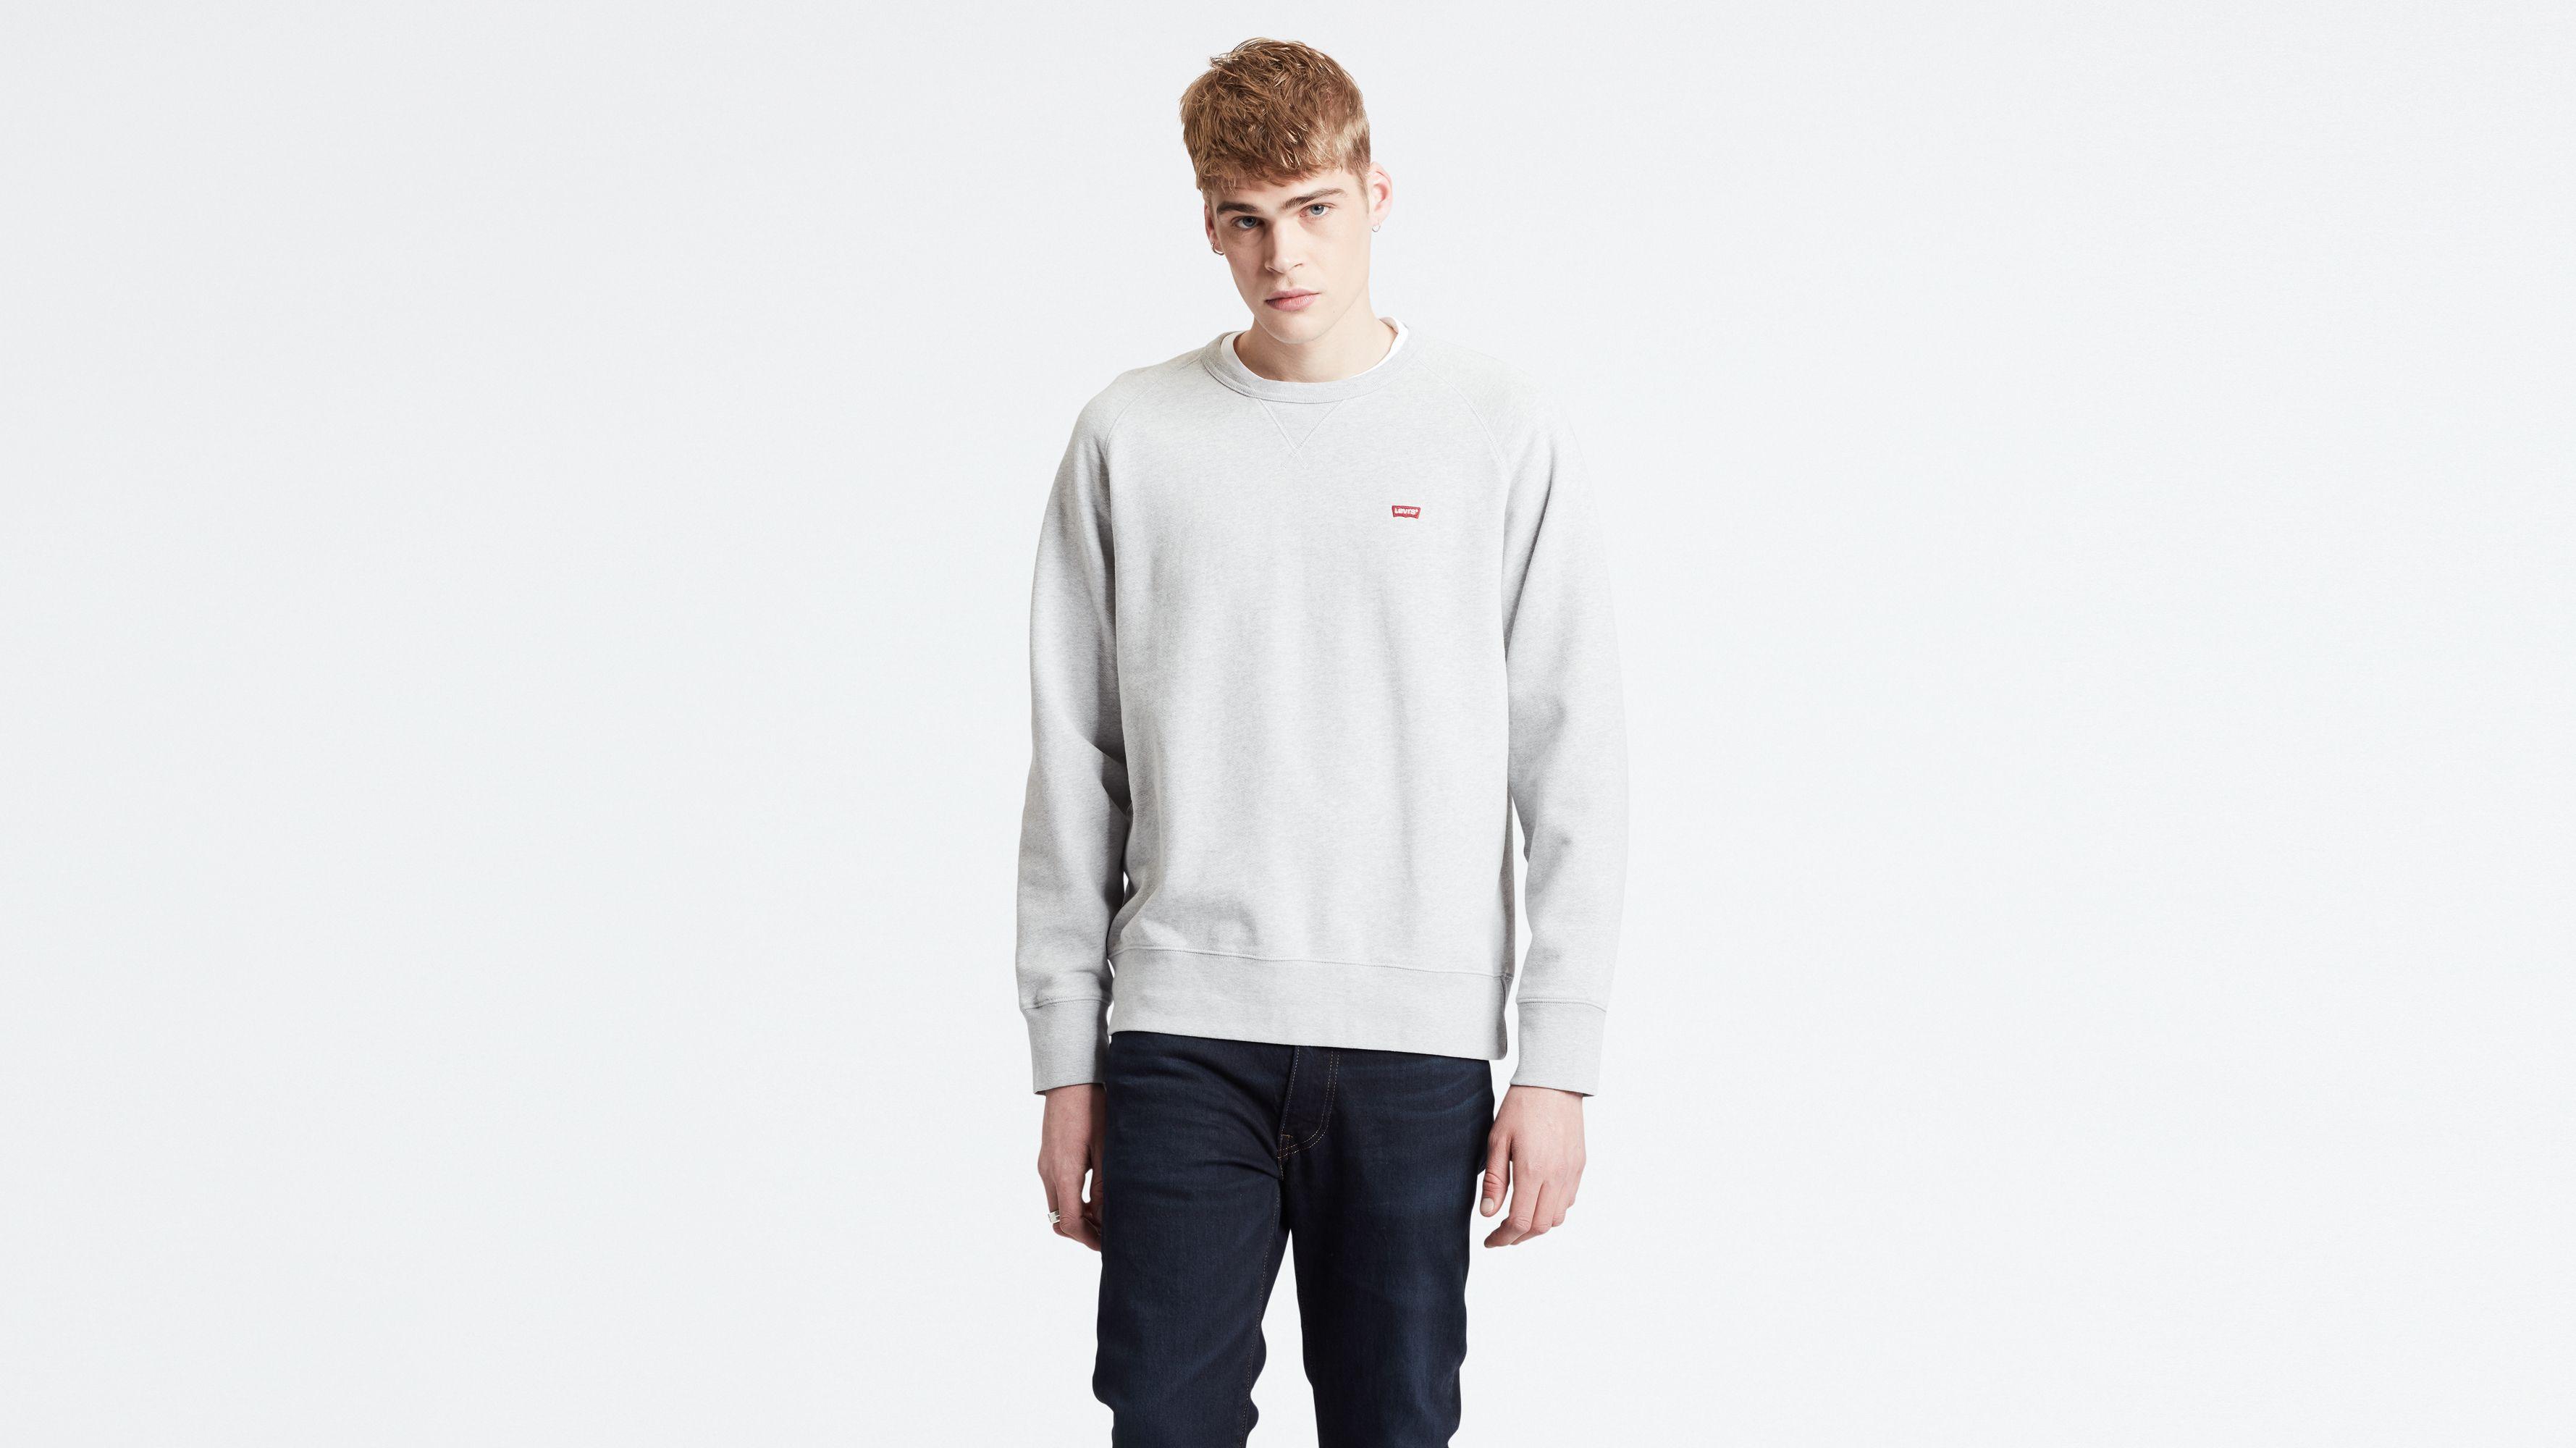 c66230939f Levi's® Original Housemark Icon Crewneck | Sweaters & Sweatshirts | Men |  Clothing | Levi's® FI